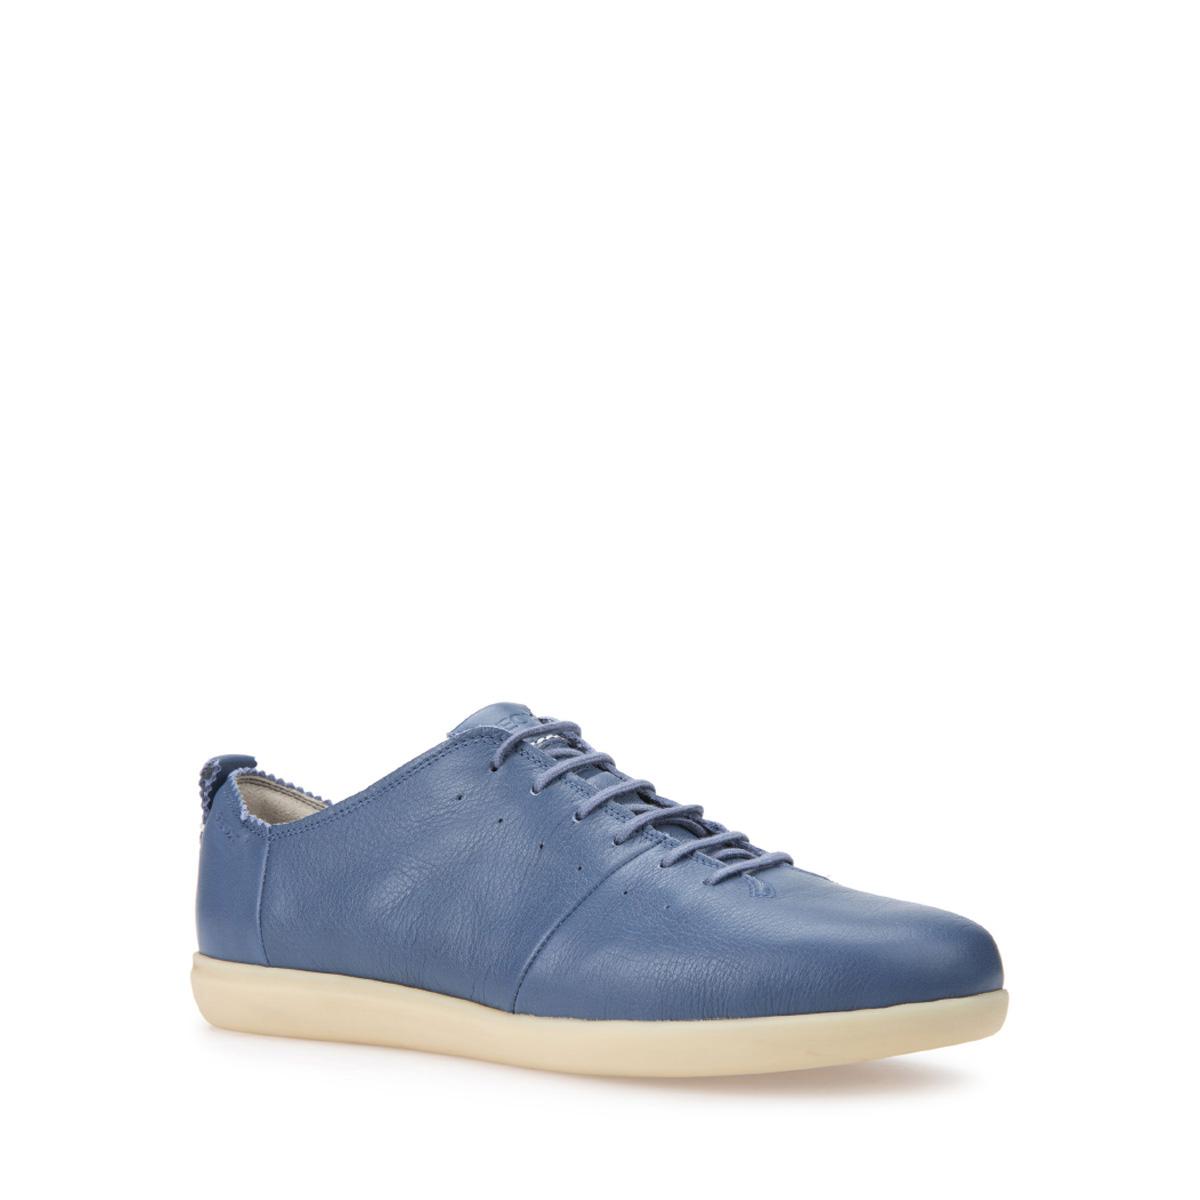 GEOX D NEW DO 義大利透氣鞋 設計師款 休閒鞋 藍色 (D724NA000854008)